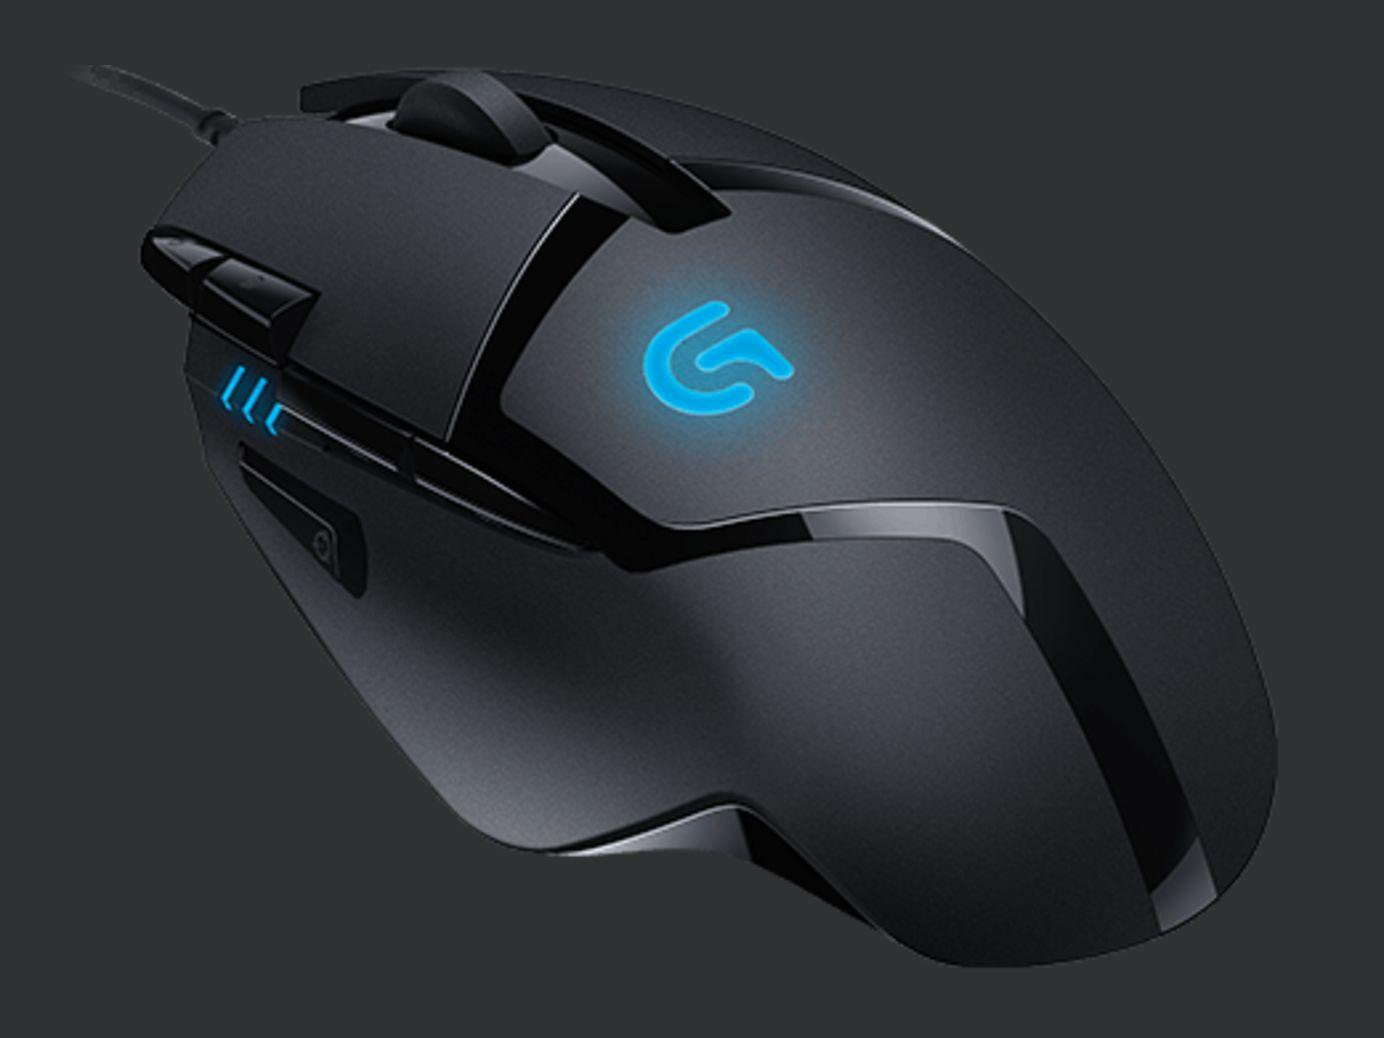 produkt-foto van 'Logitech Gaming Muis - g402 Hyperion Fury, zwart, laser, 7 knoppen'